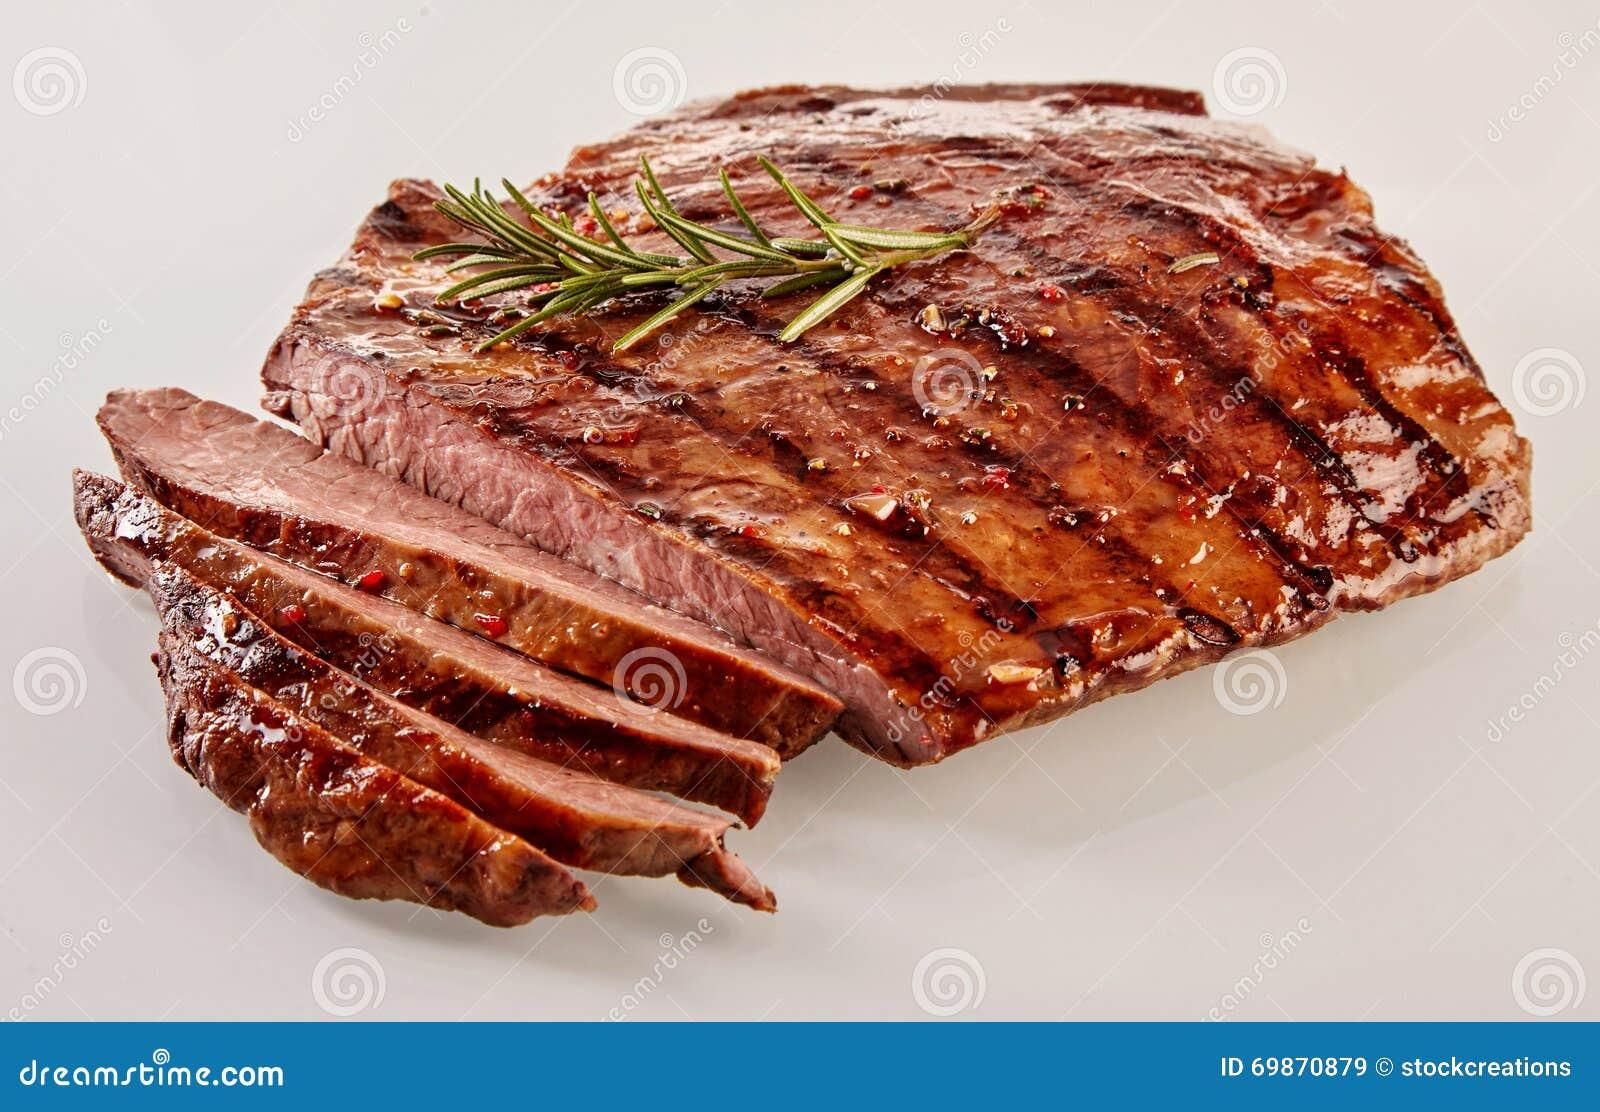 Carved barbecued средств-редкий стейк фланка